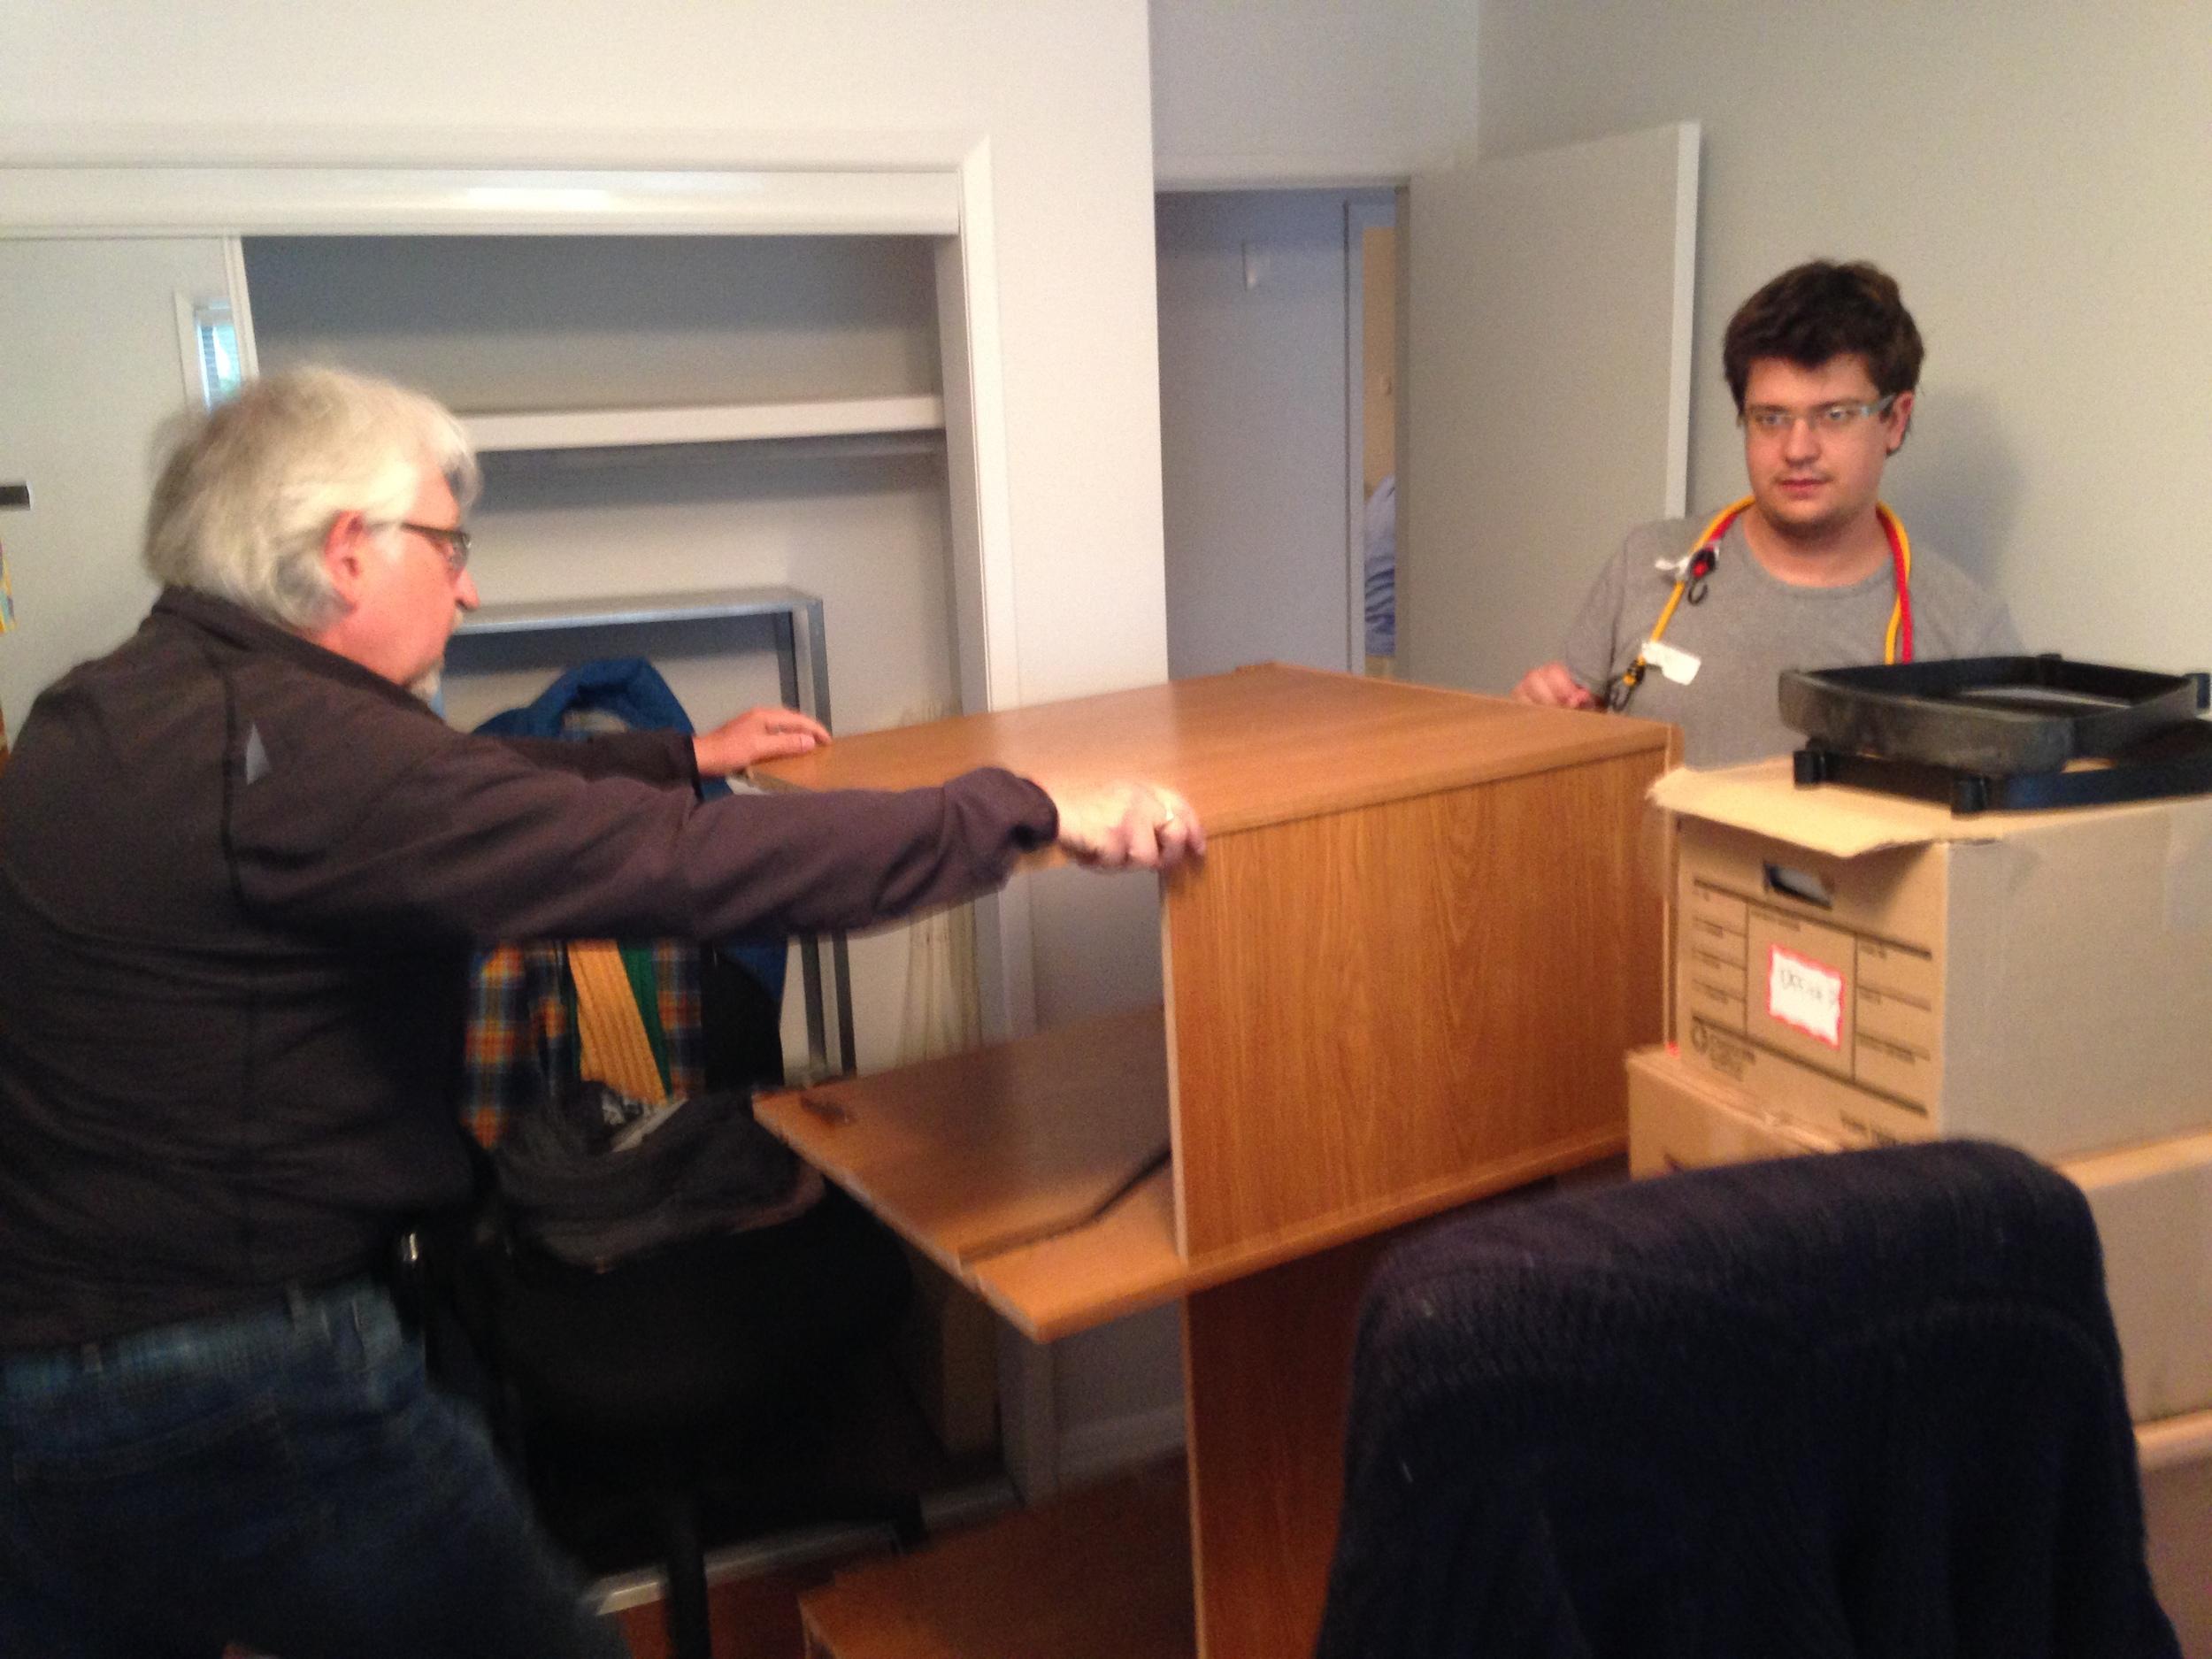 Moving Furniture!